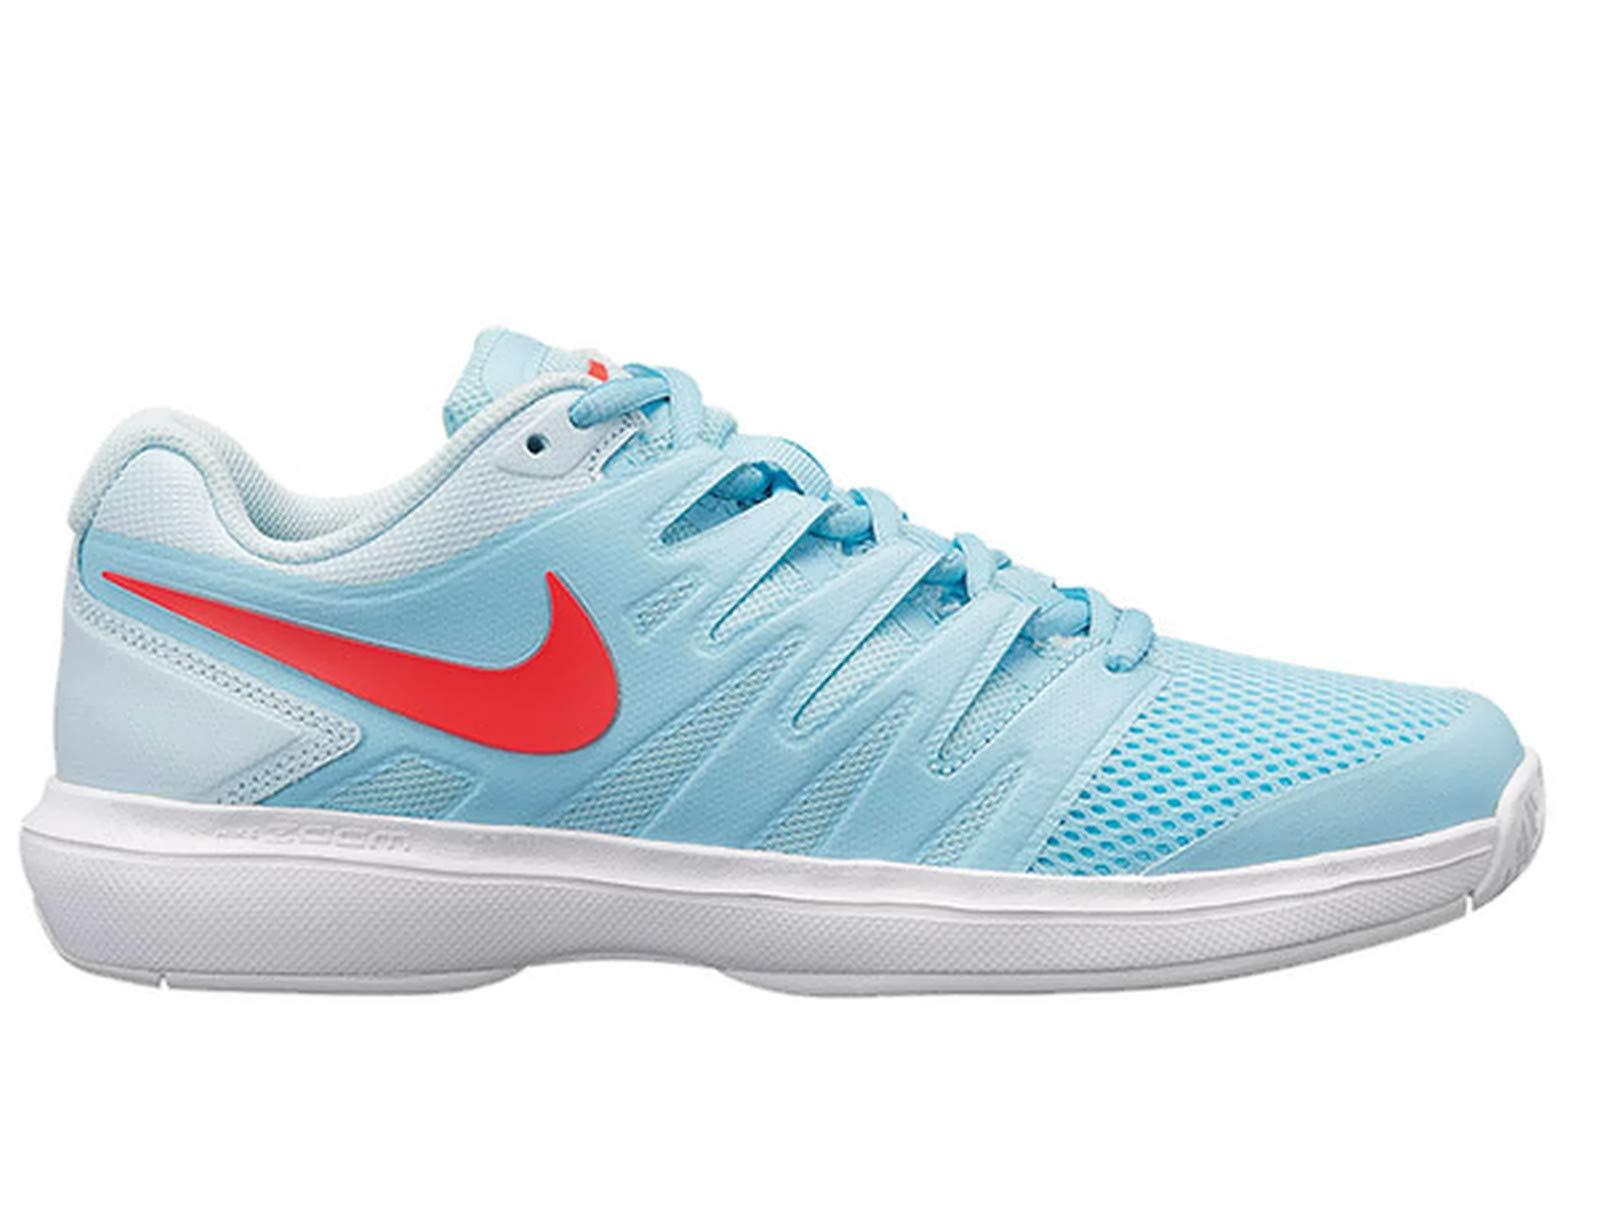 3e0ef306a614 Galleon - Nike Women s Air Zoom Prestige Tennis Shoes (8.5 B US ...